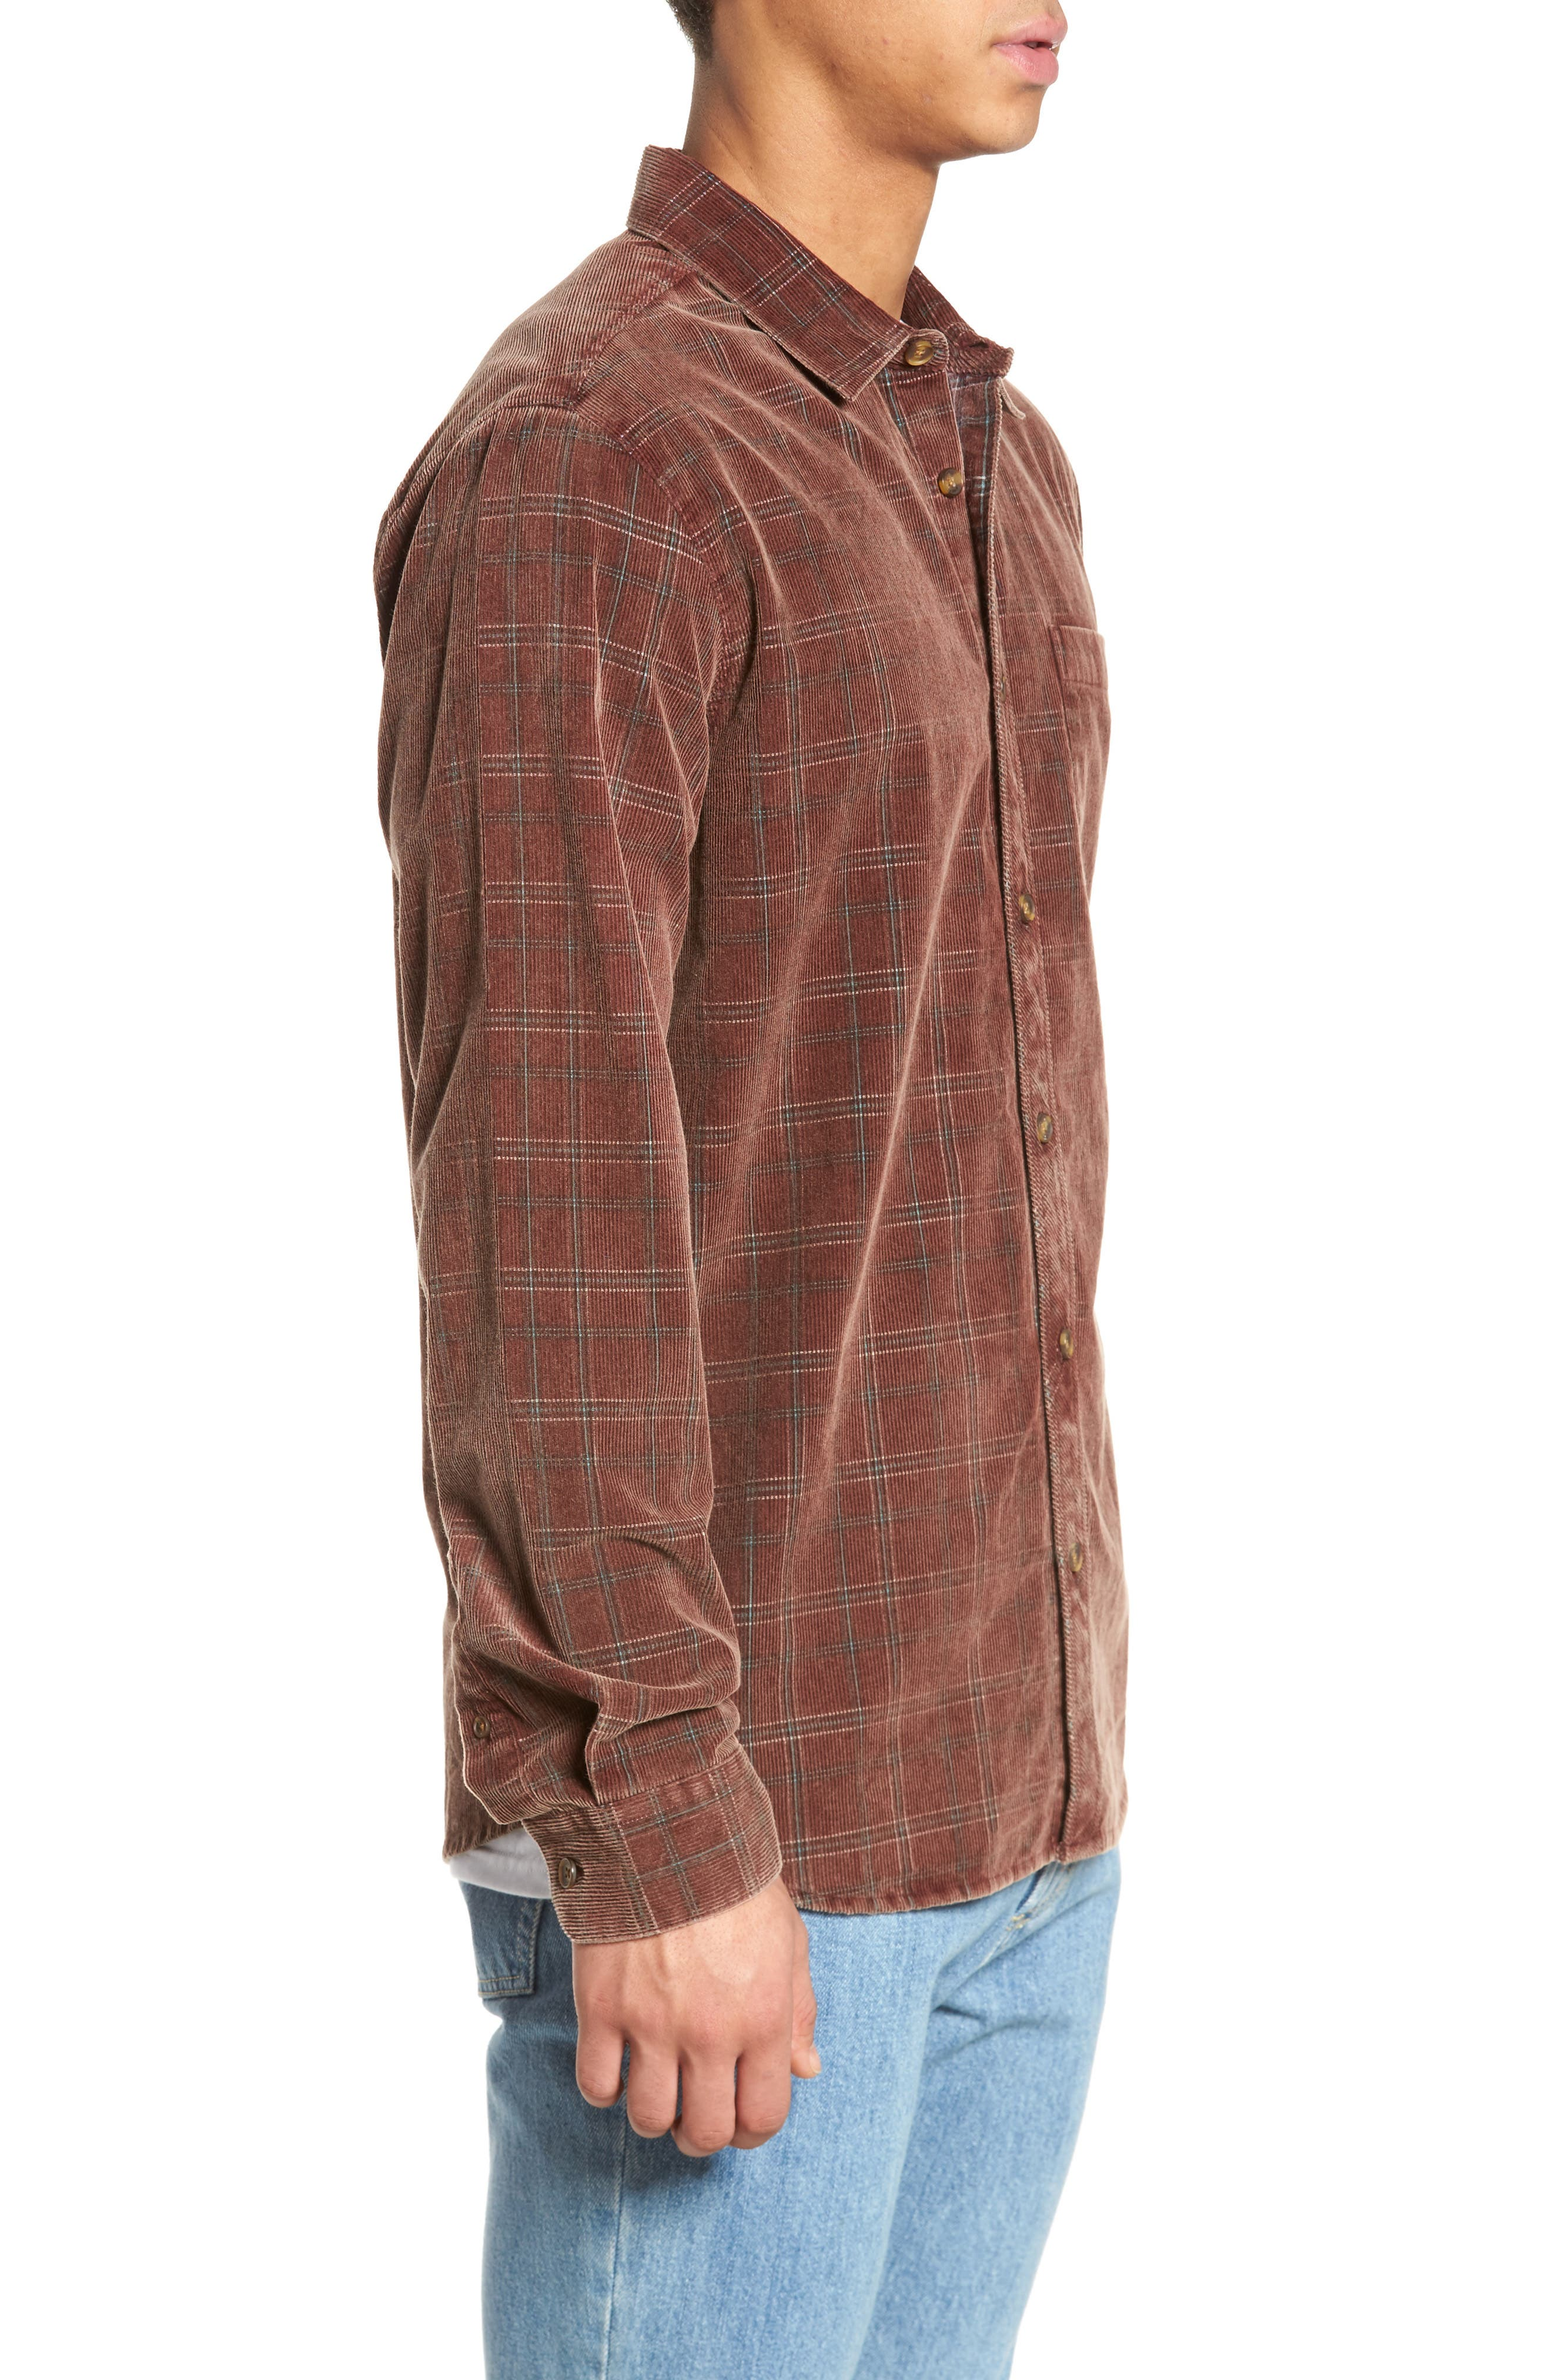 Bradley Corduroy Shirt,                             Alternate thumbnail 3, color,                             Burgundy